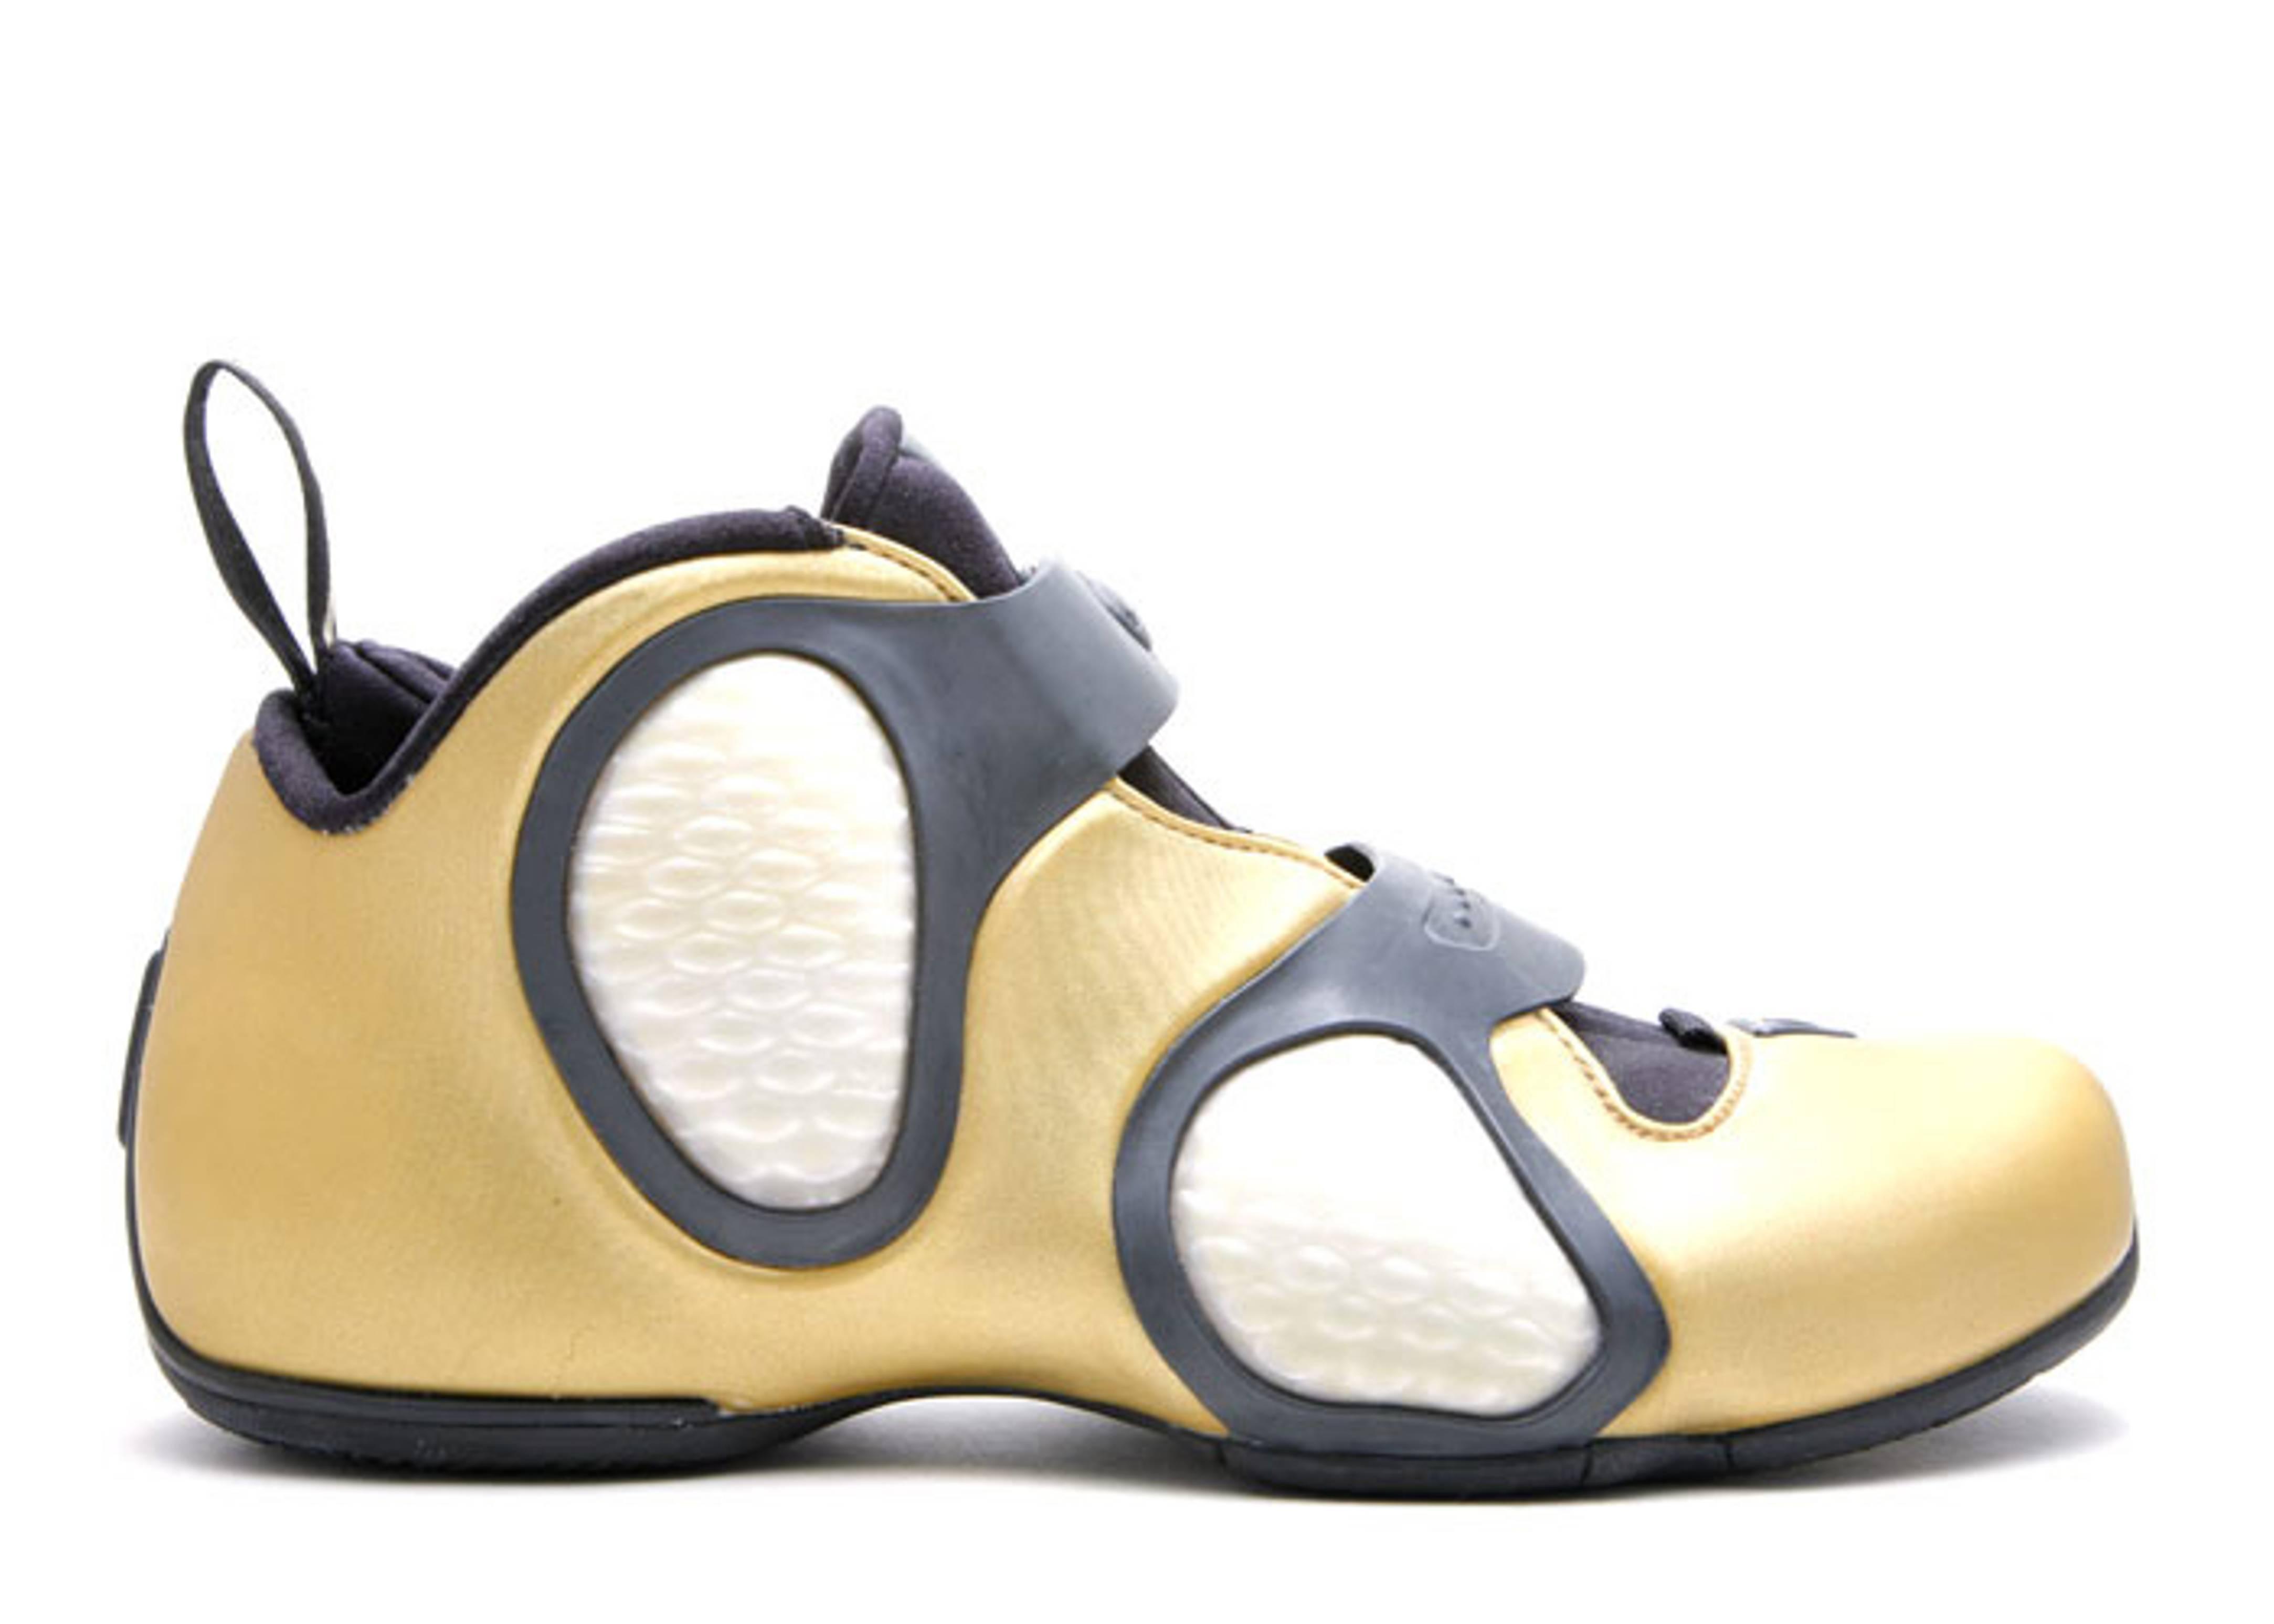 f188997034c4 Air Flightposite 3 Bg - Nike - 304515 701 - metallic gold black ...